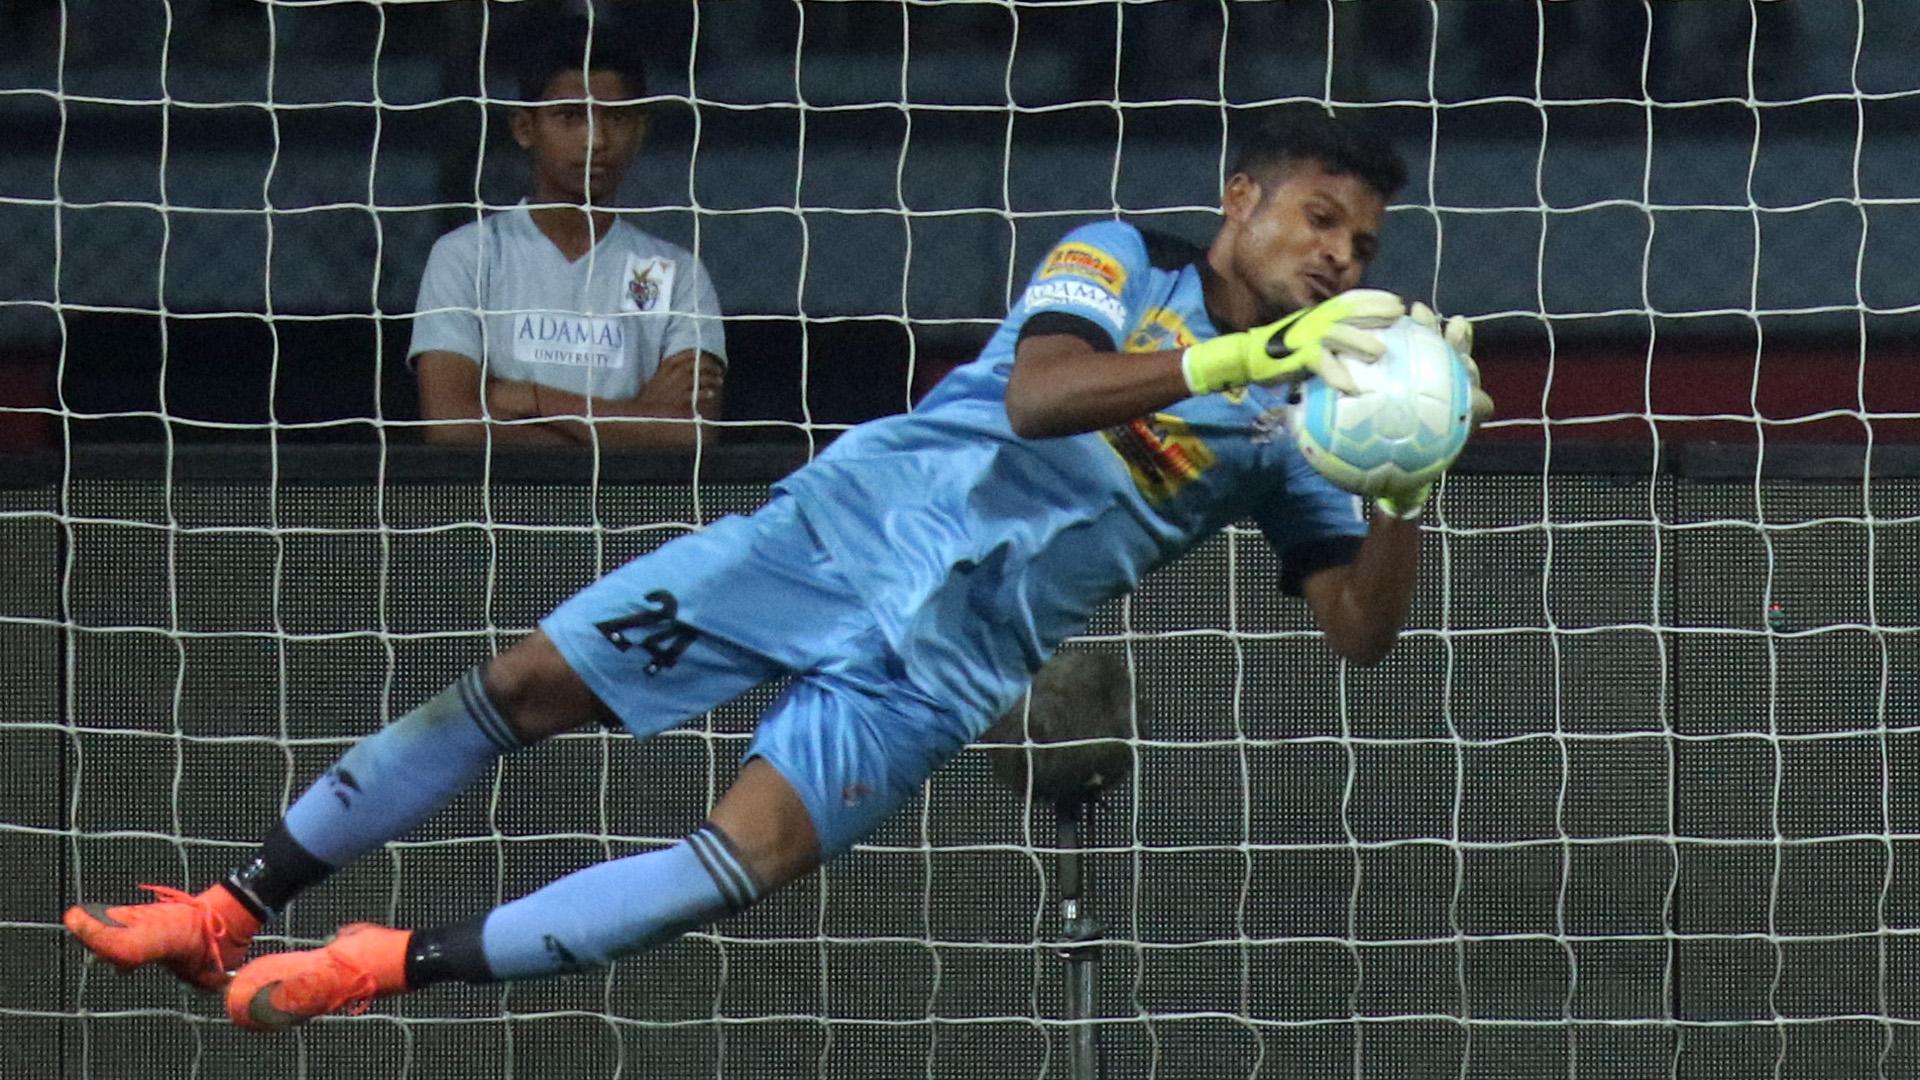 Debjit Majumder Atletico de Kolkata NorthEast United FC ISL season 3 2016